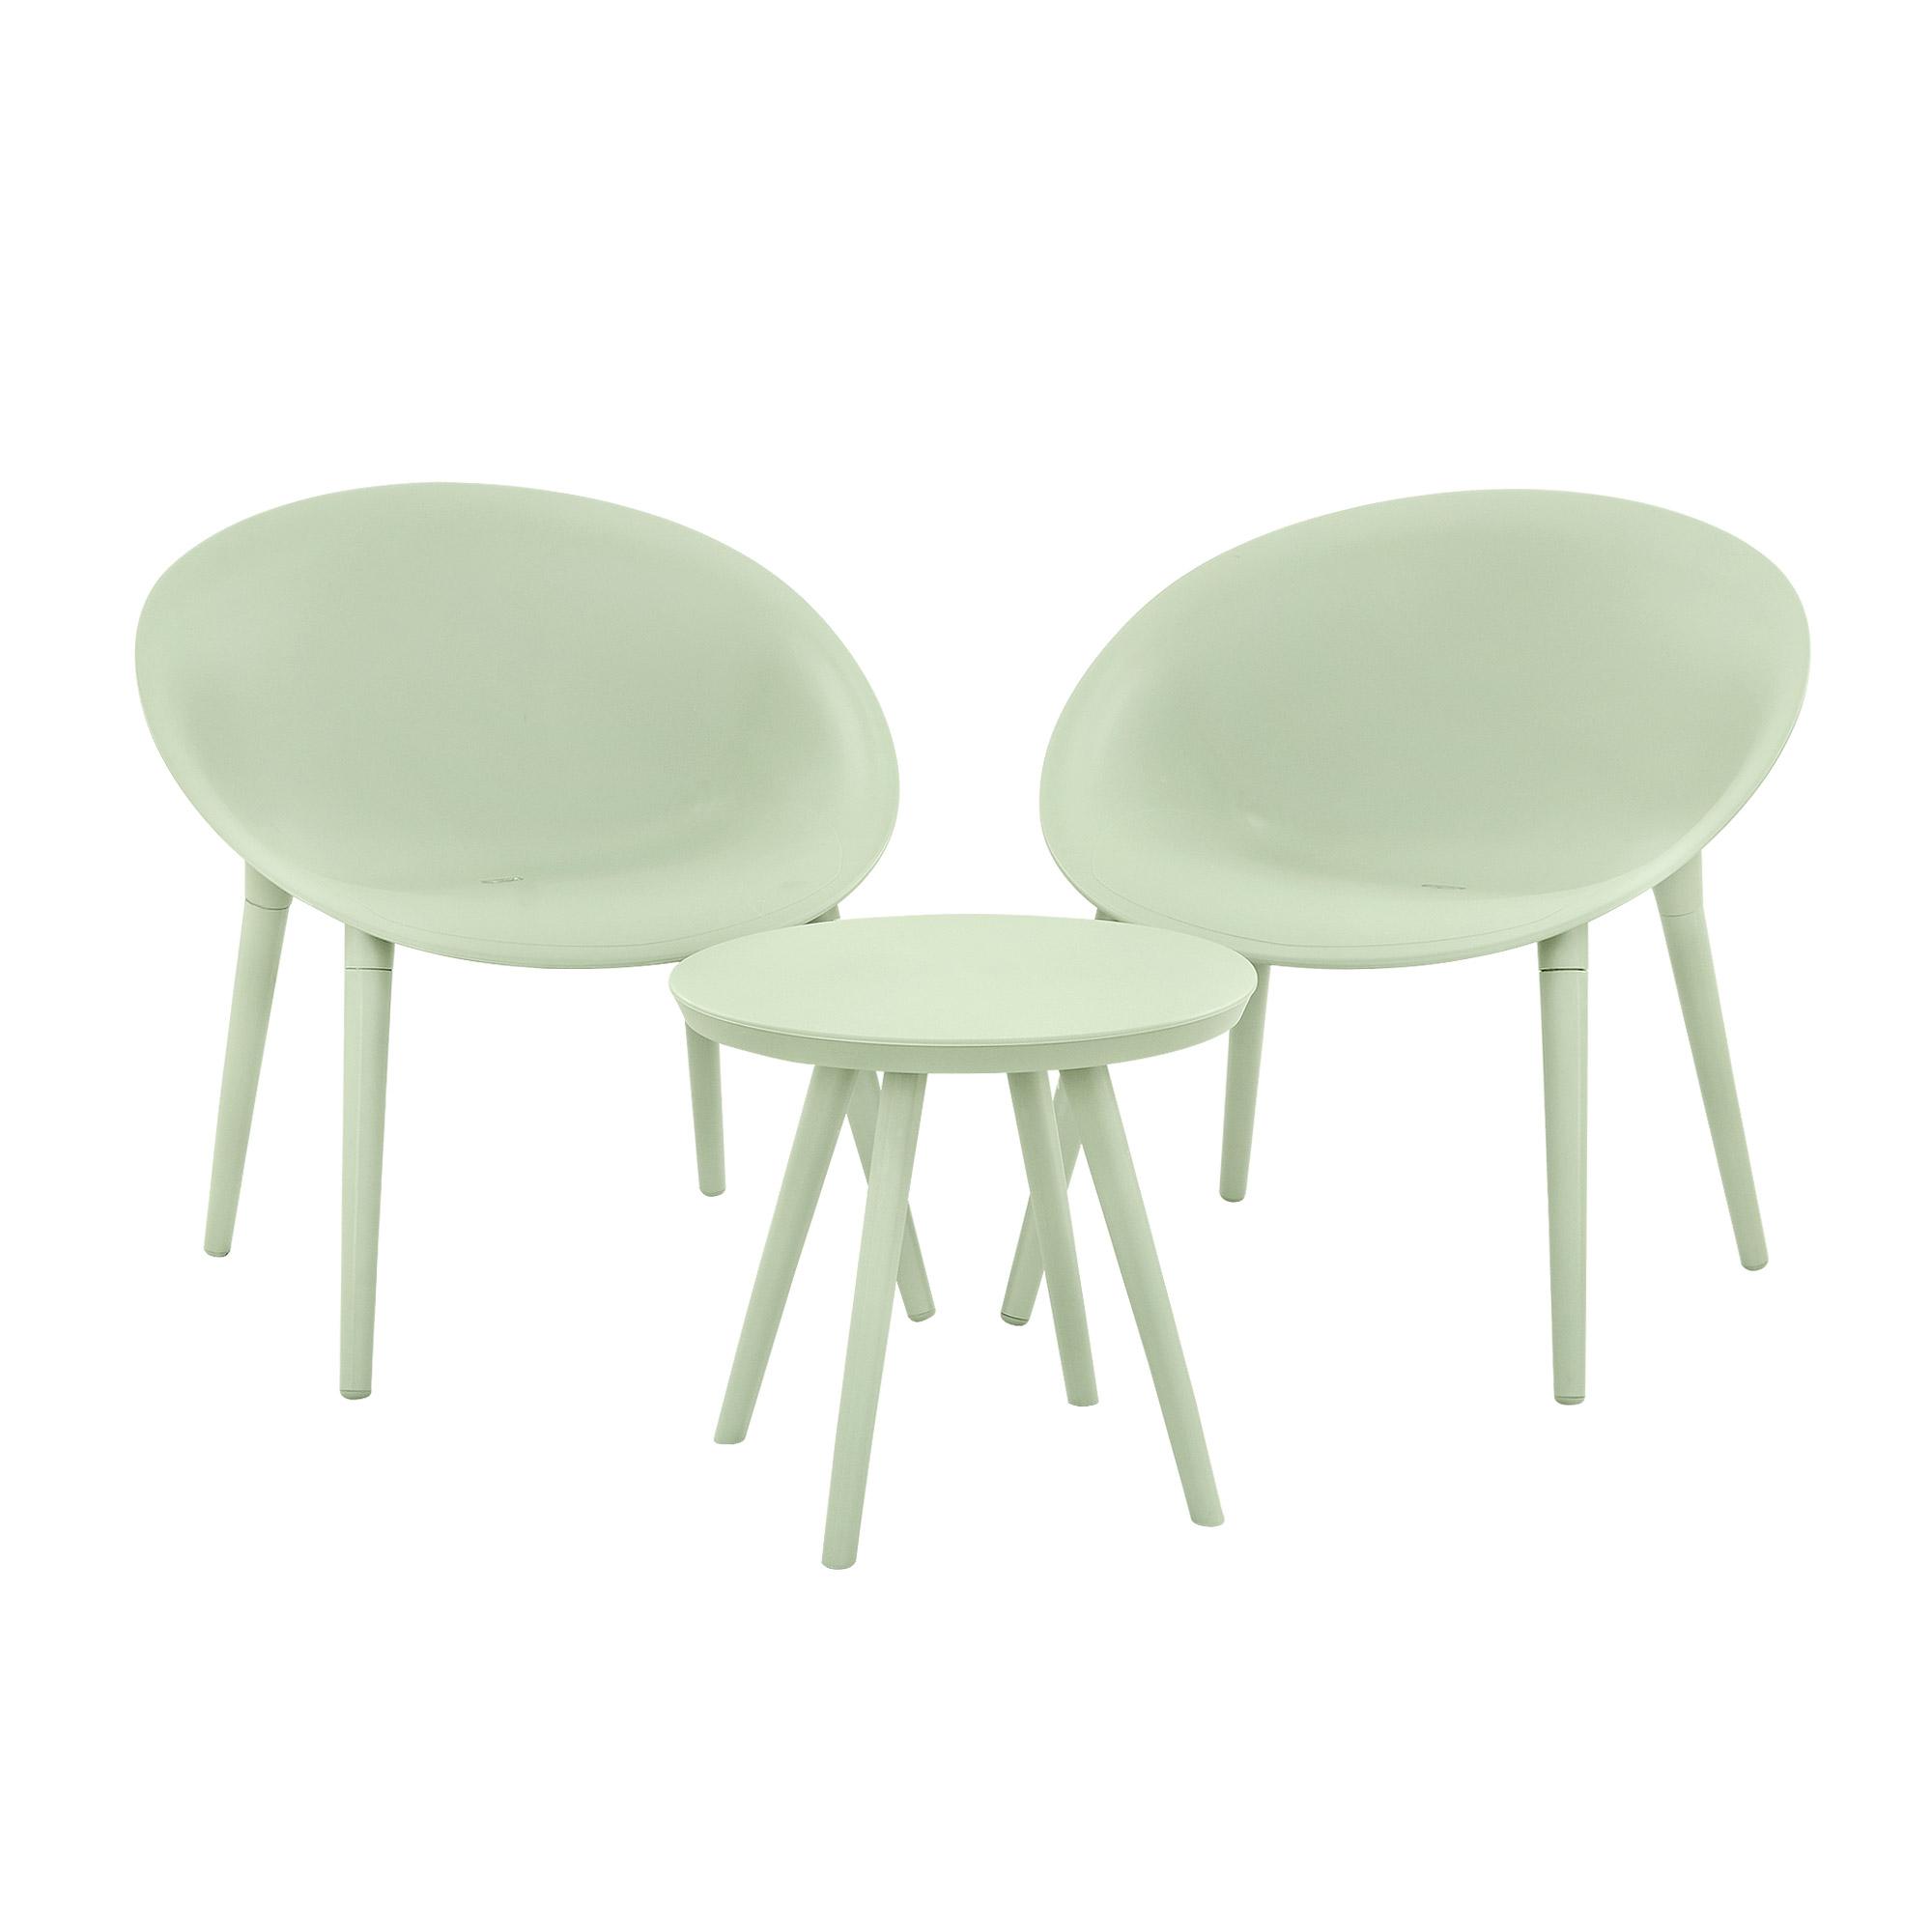 Комплект мебели Kaemingk furniture Marbella стол/2стула зеленые